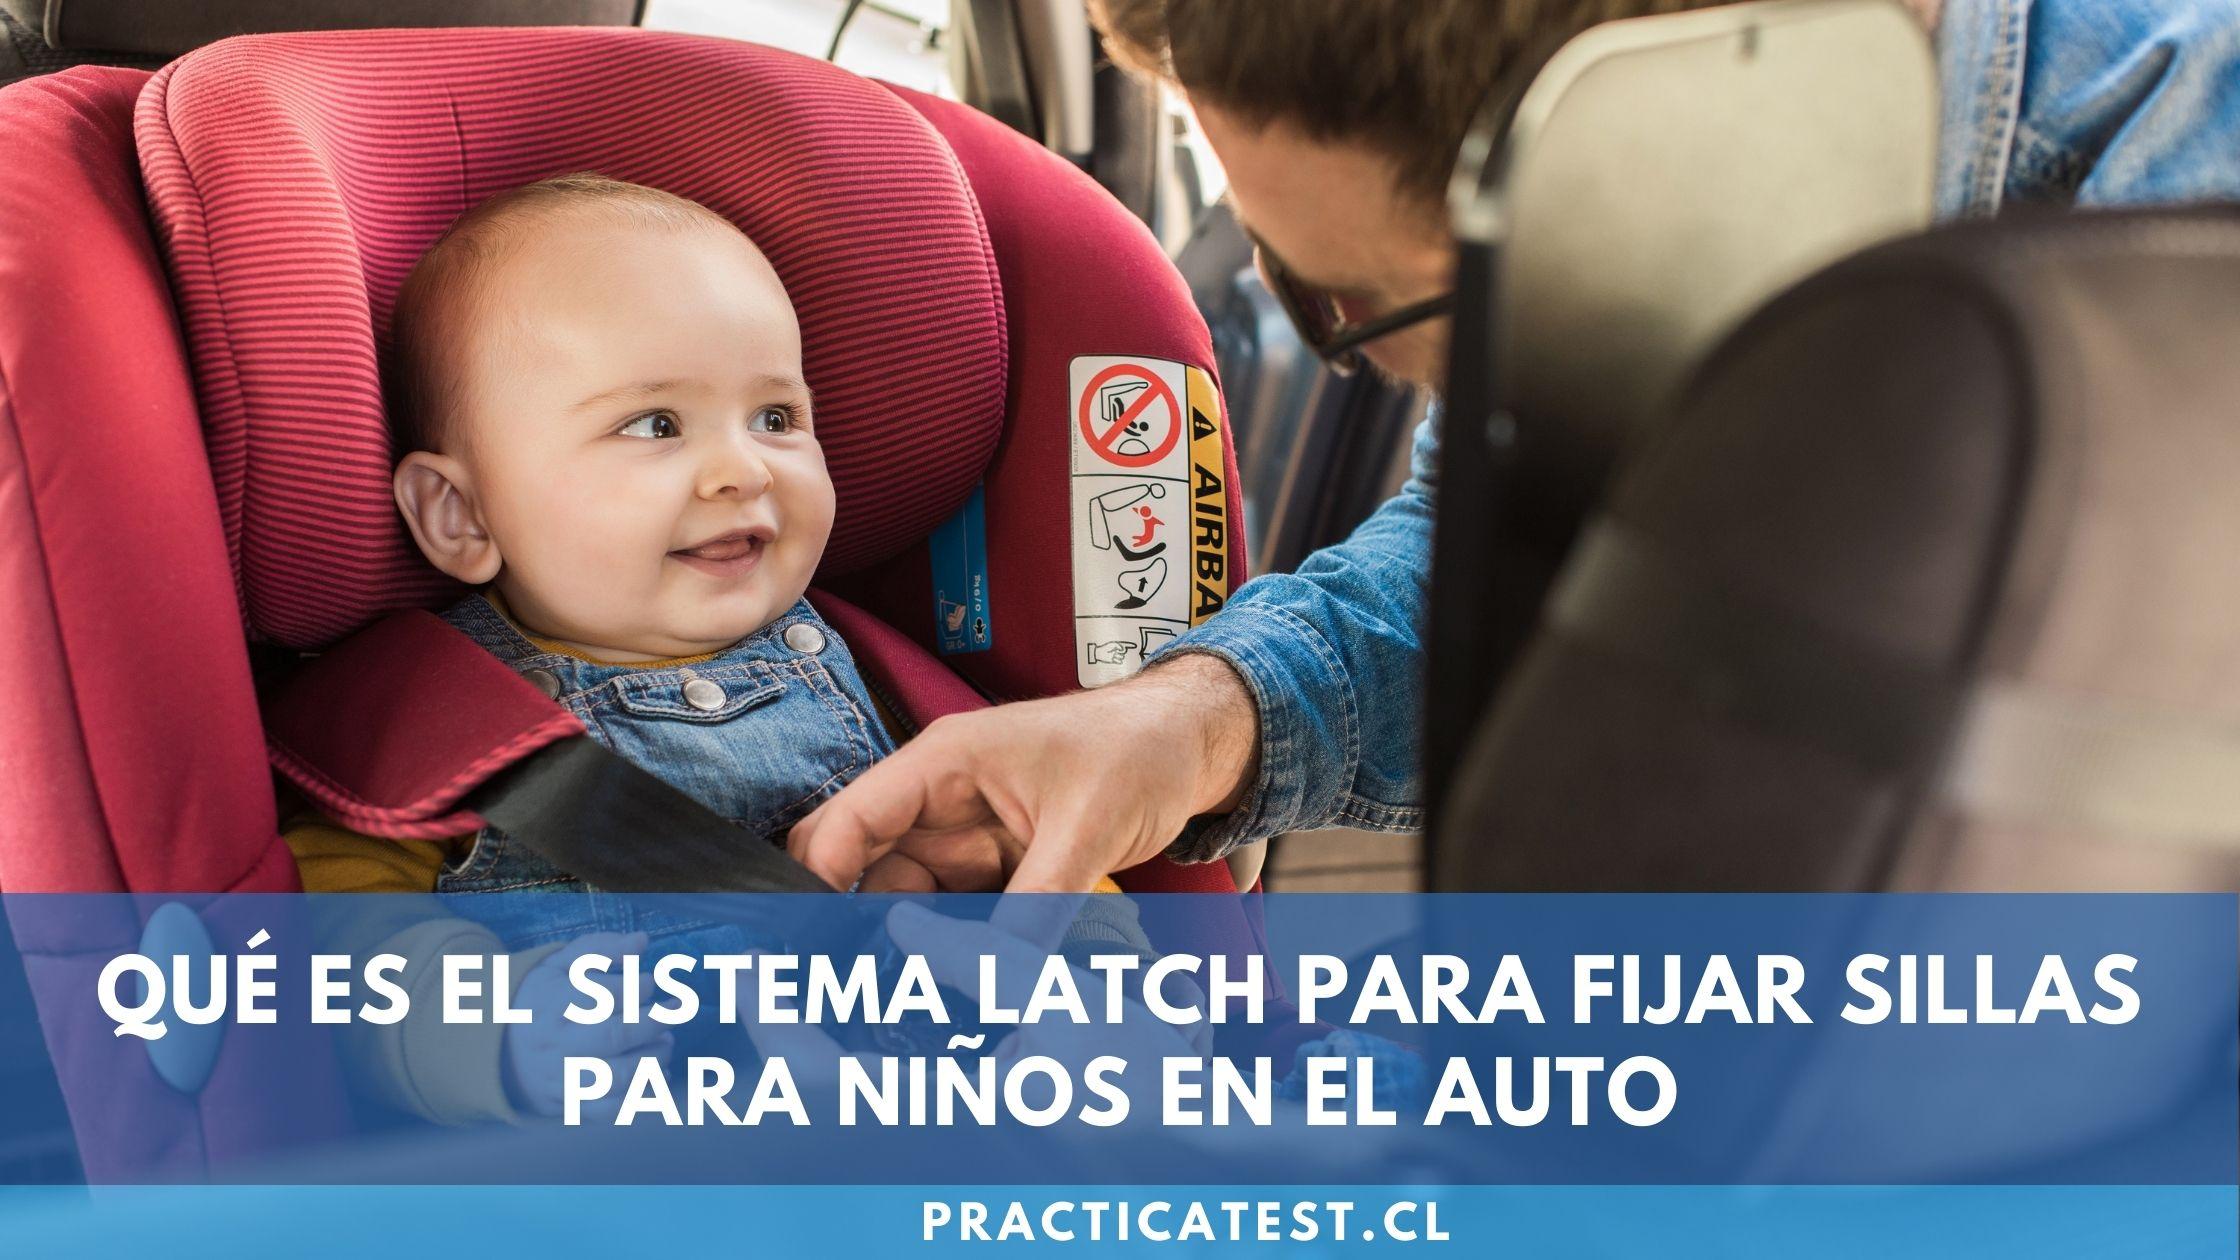 Diferencias entre sistema Latch e Isofix en un sistema de retención infantil para auto.